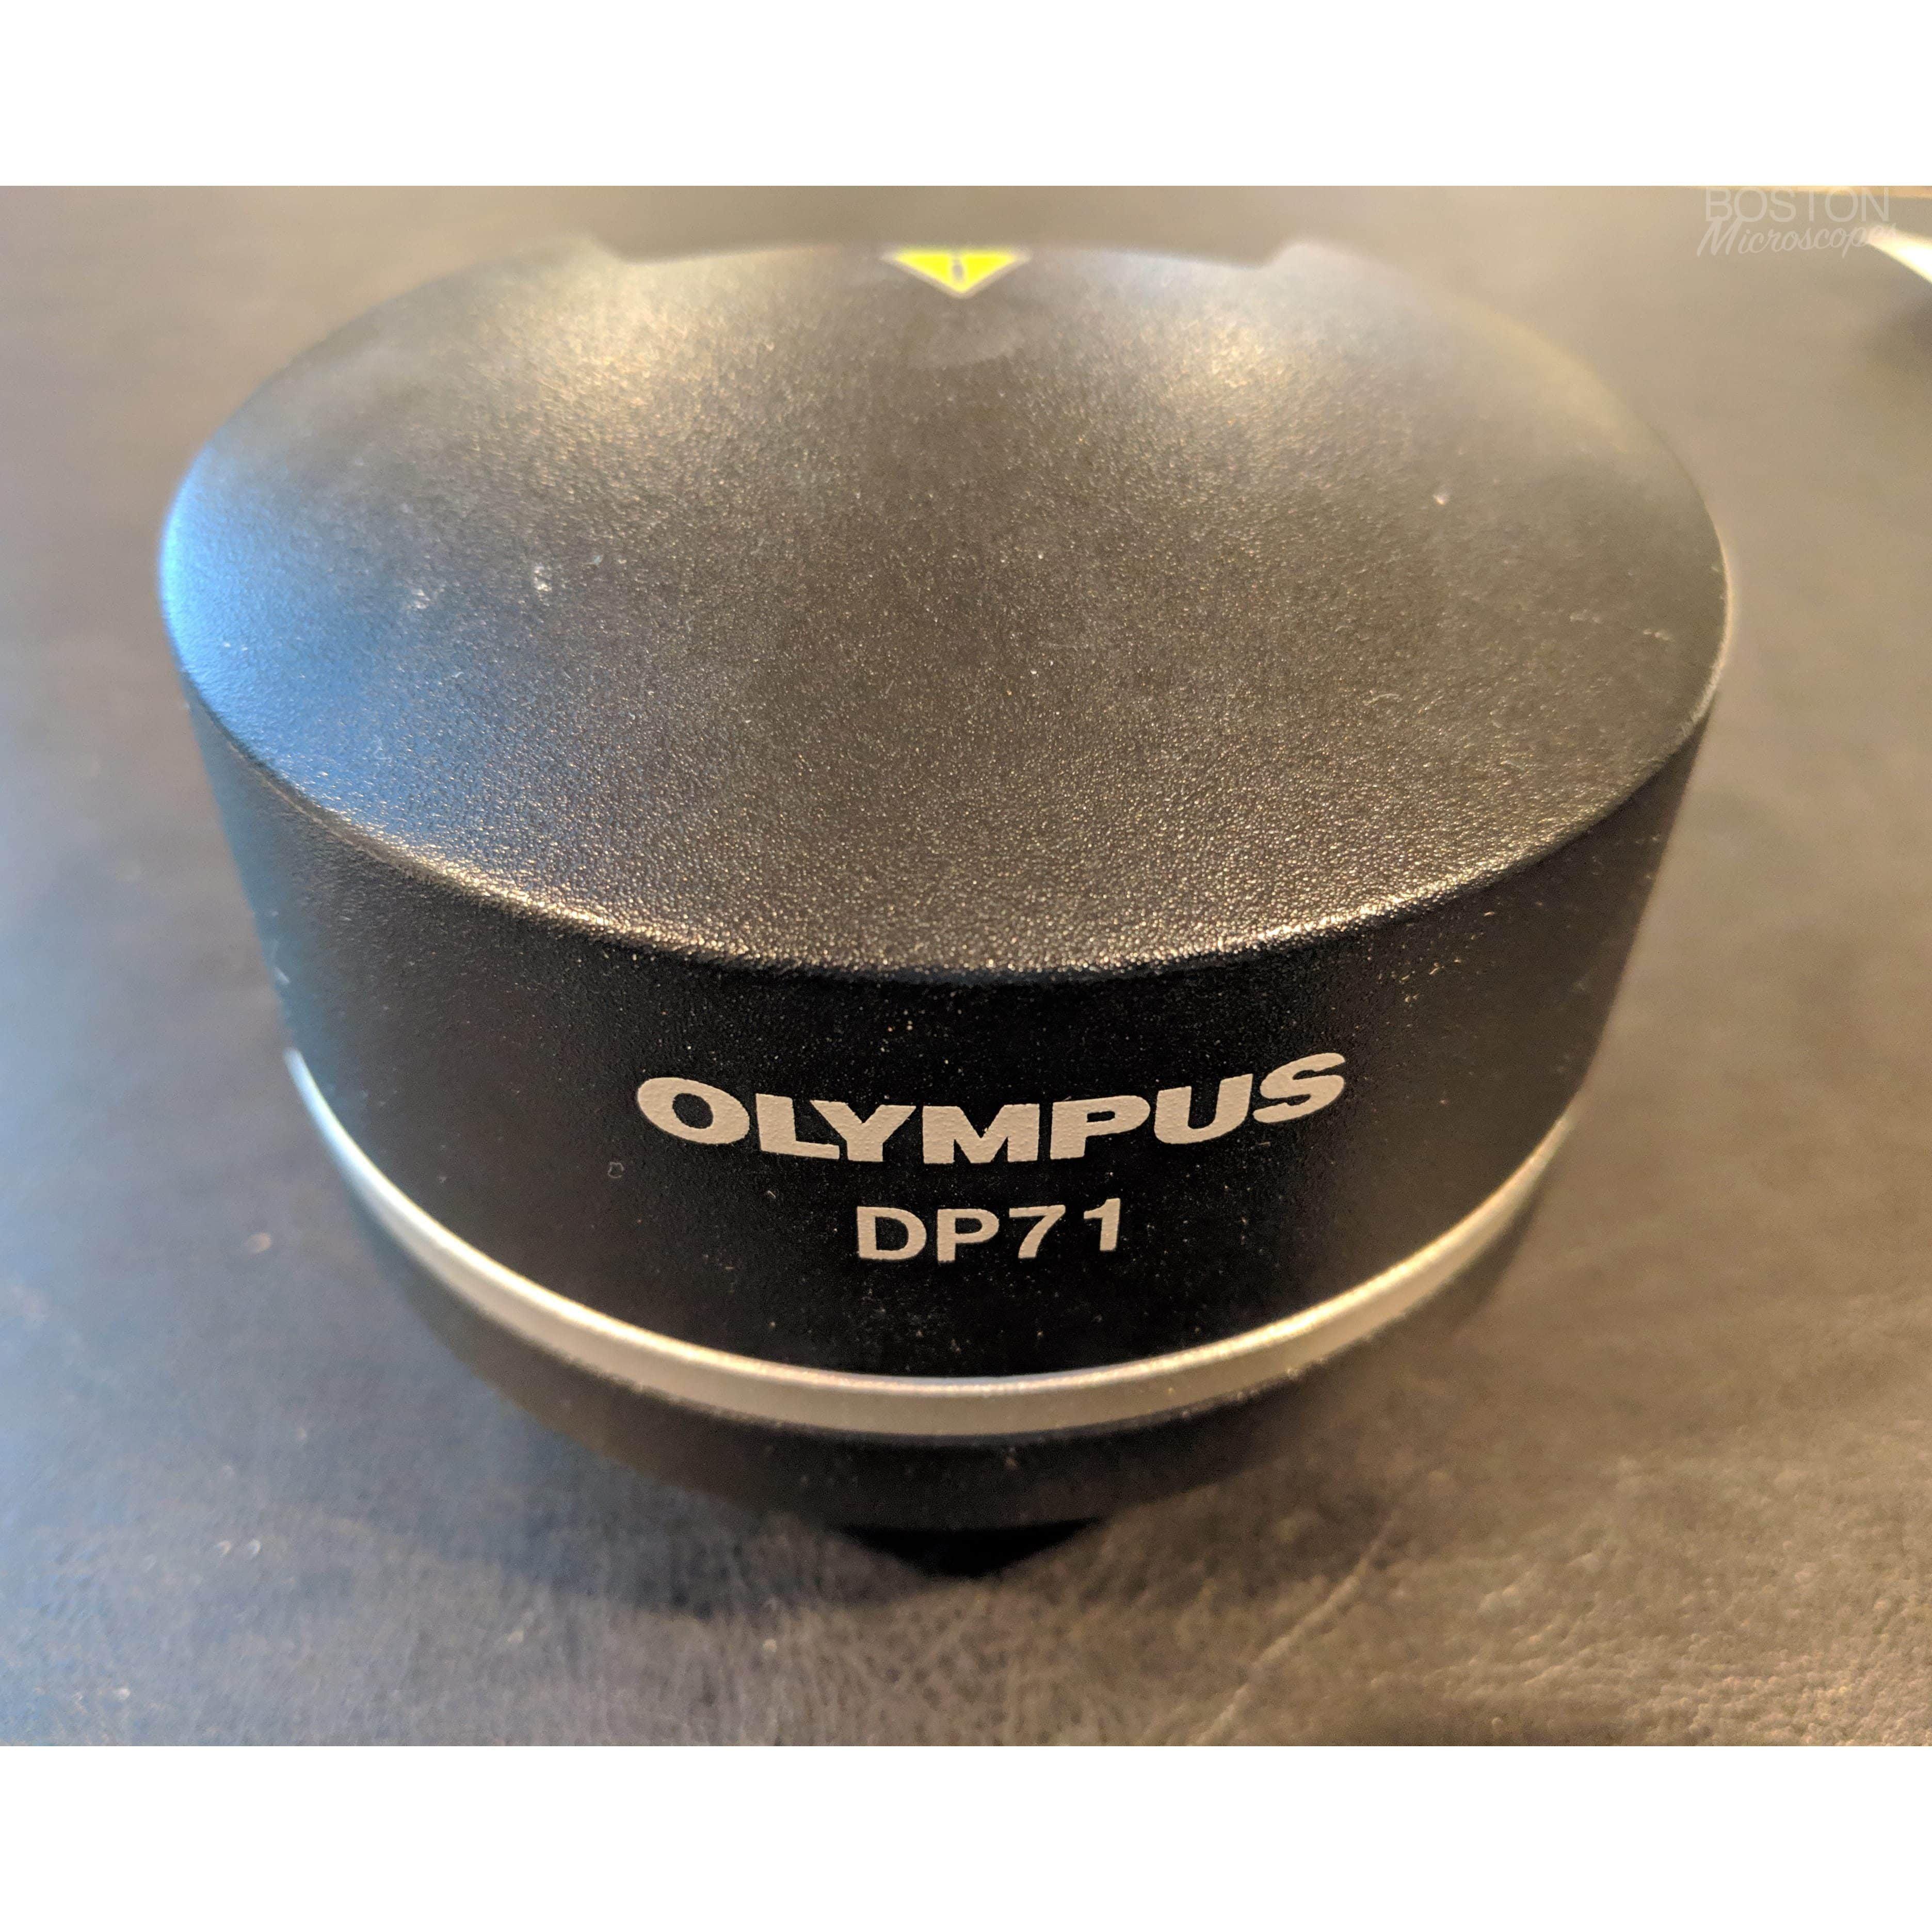 Olympus DP71 1.4MP Color Microscope Camera